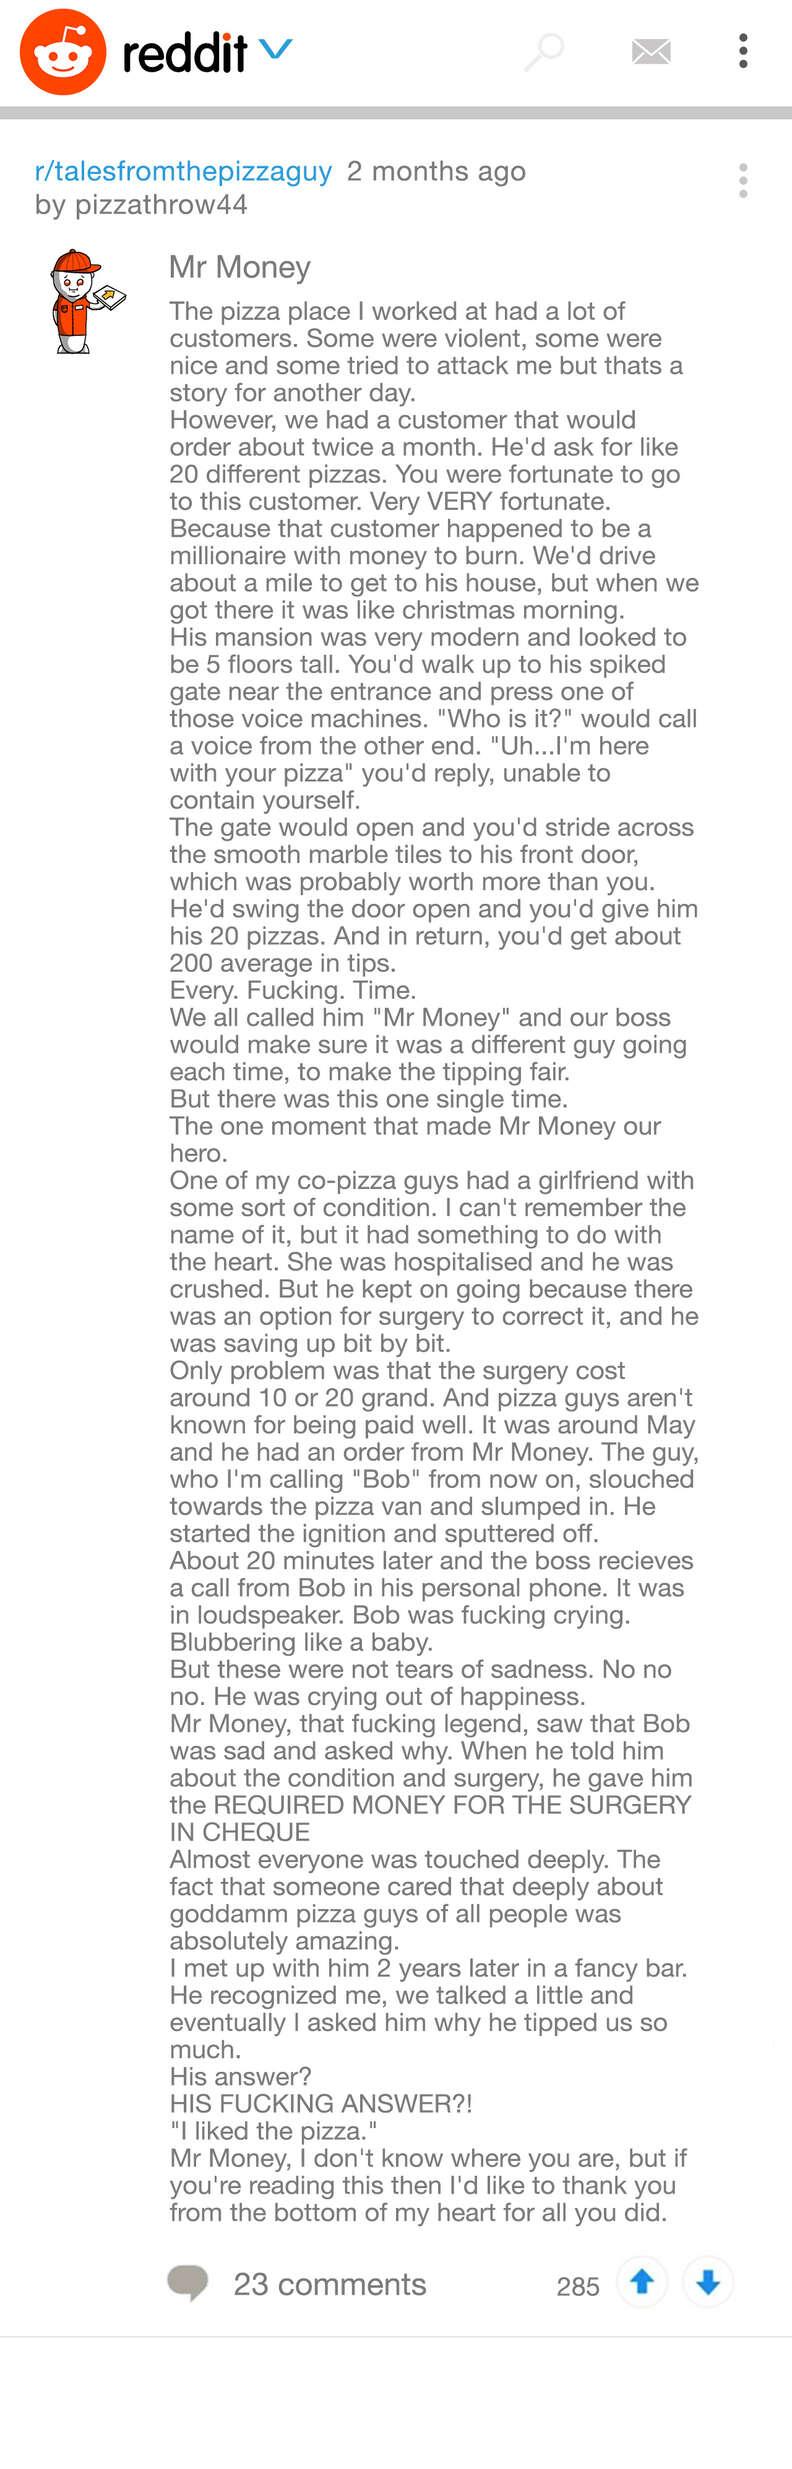 pizza story on Reddit